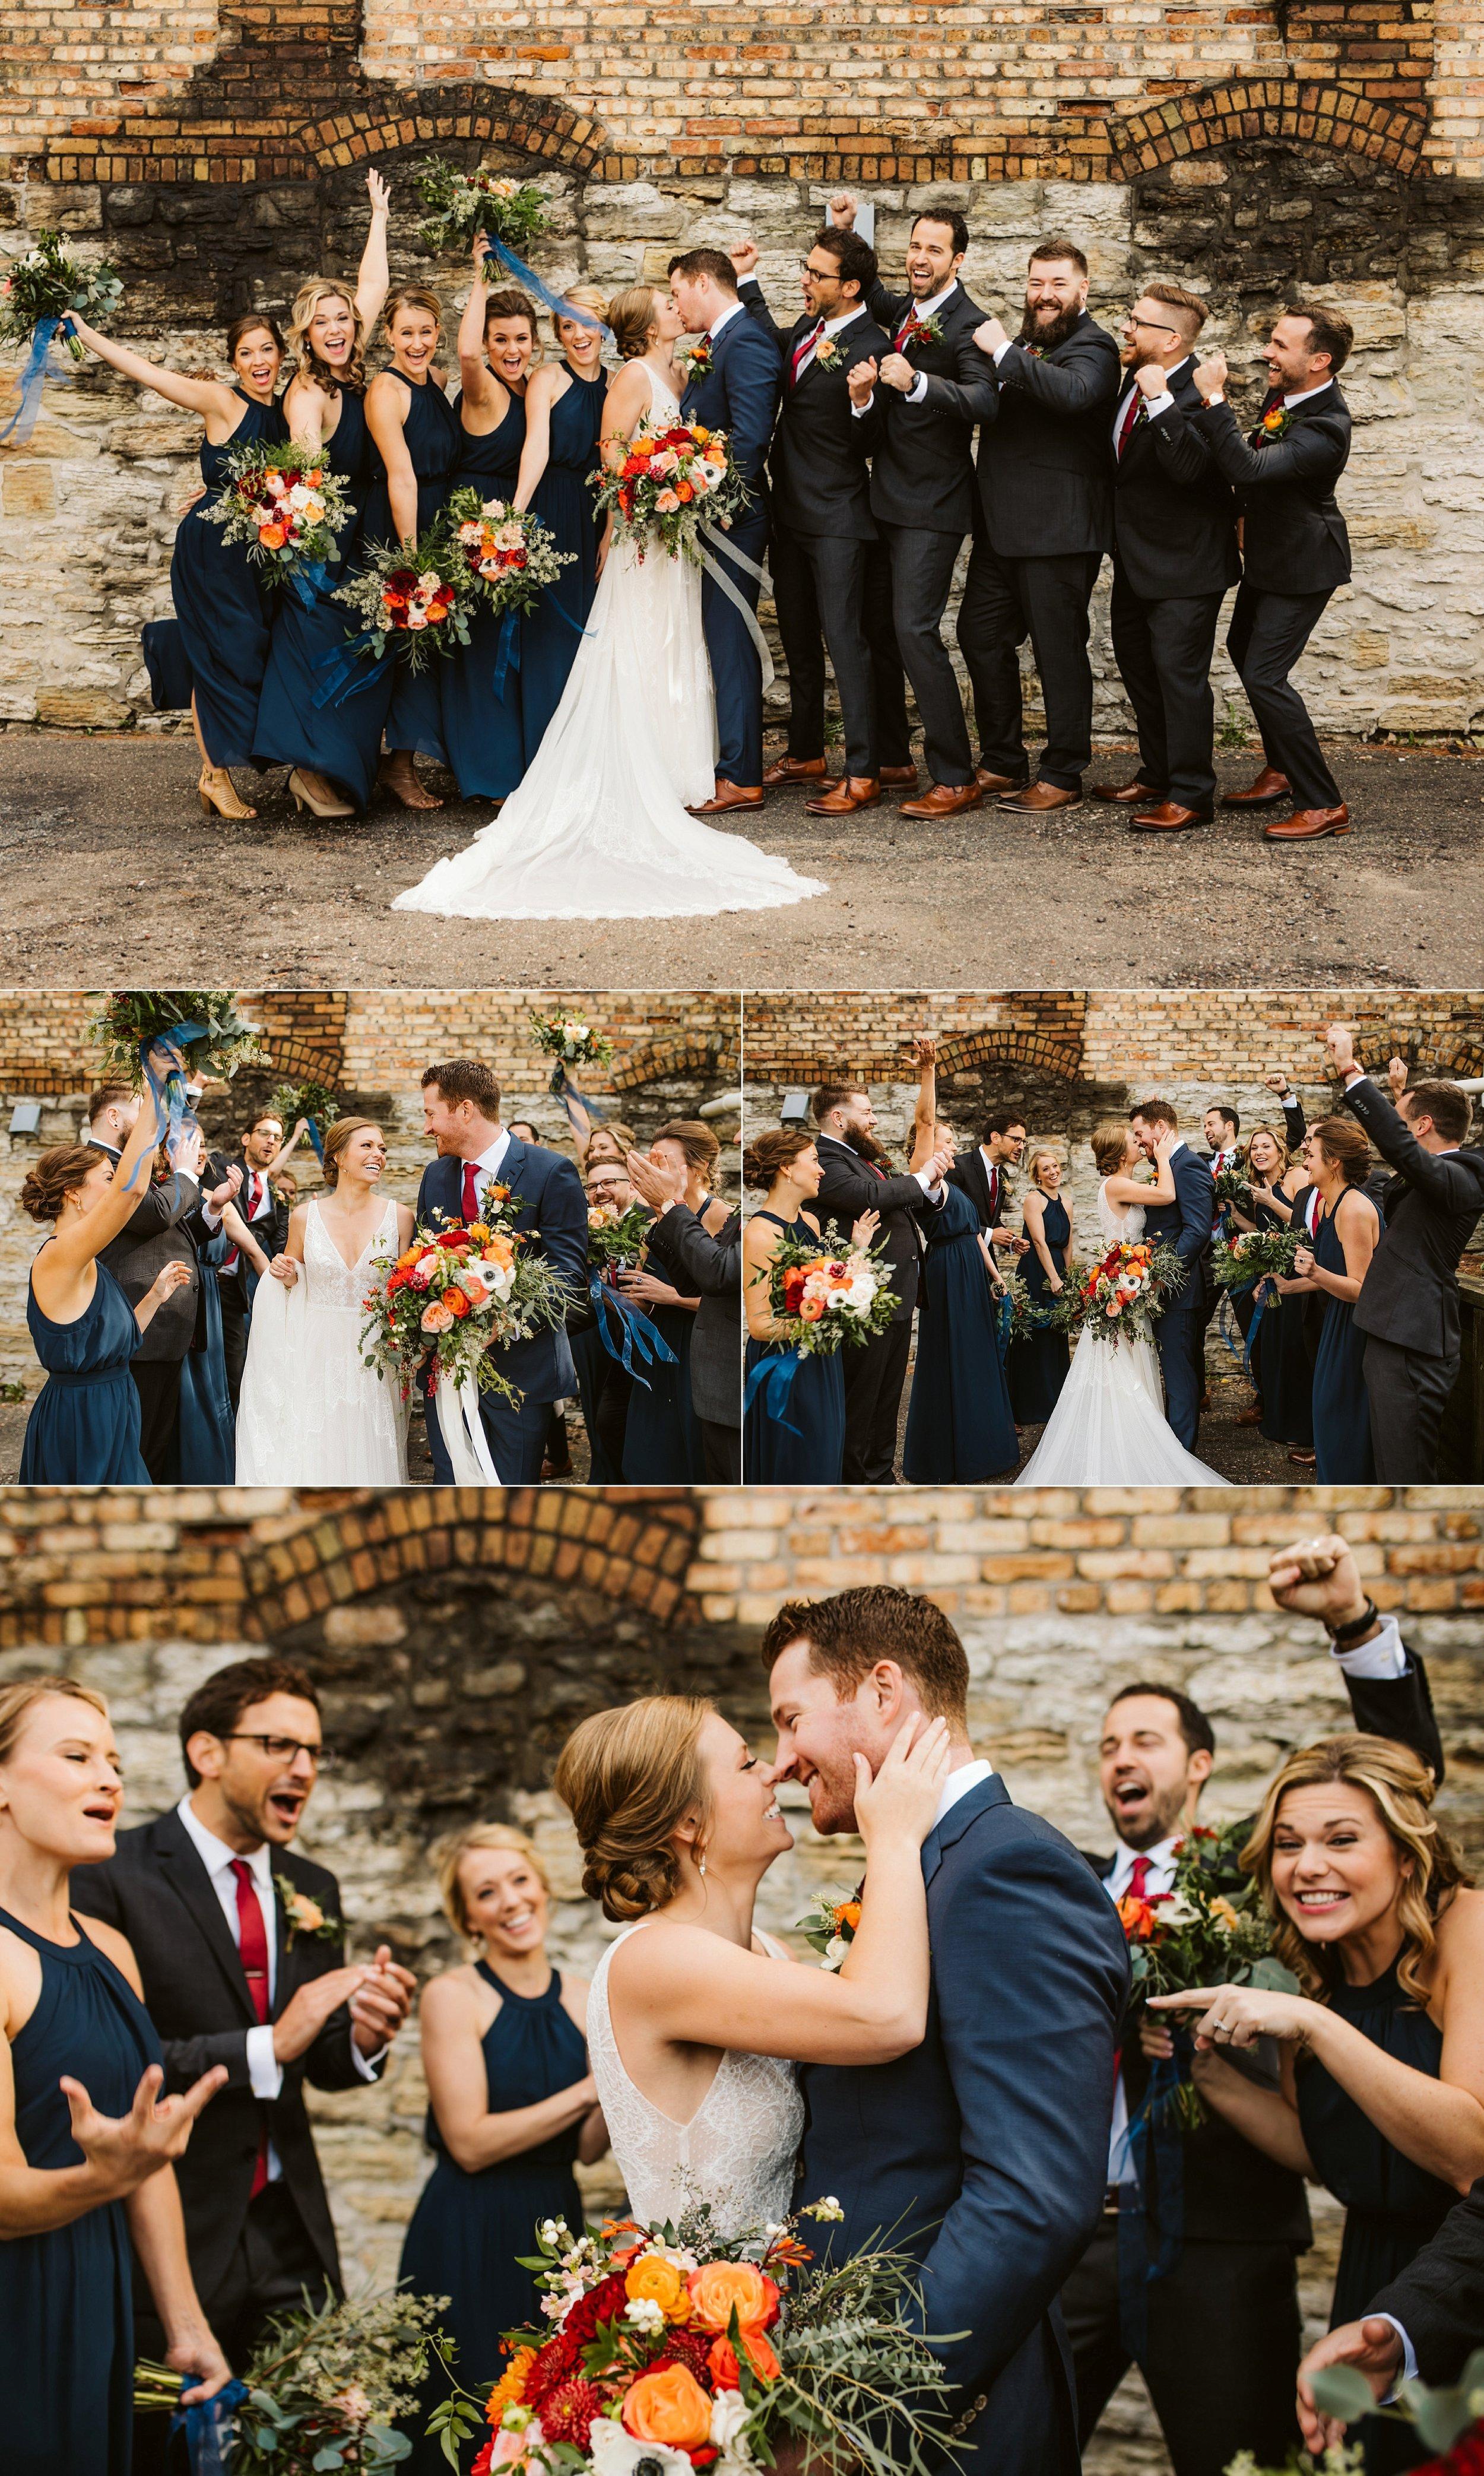 Nicollet-Island-Pavilion-Minneapolis-September-Coral-Navy-Wedding-82.jpg